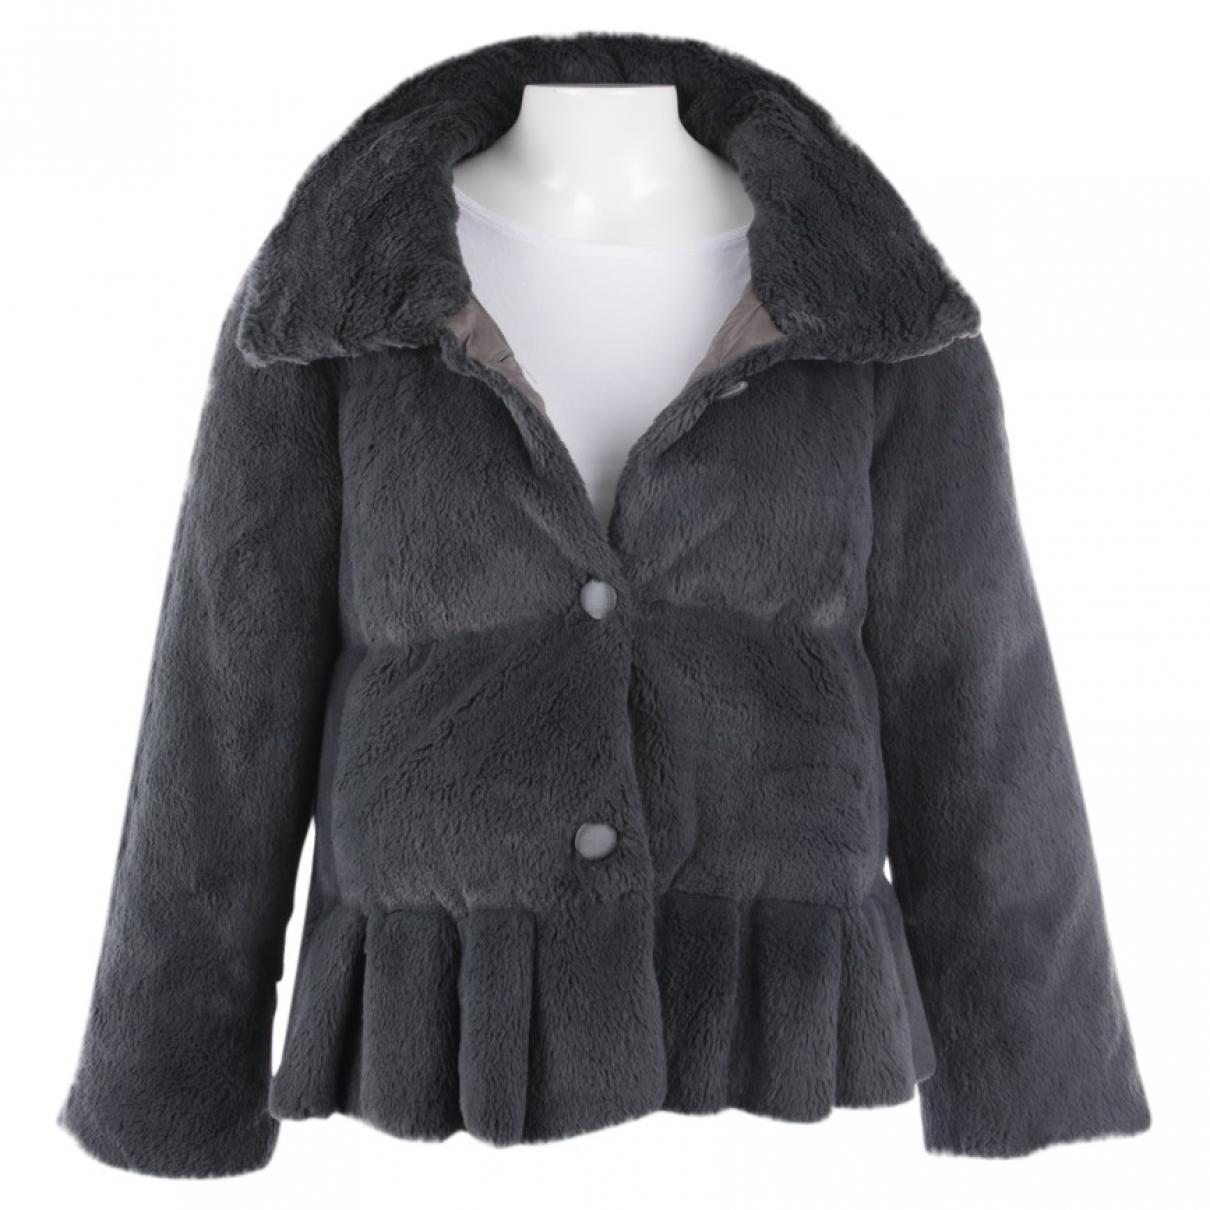 Armani Collezioni \N Blue jacket for Women 36 FR